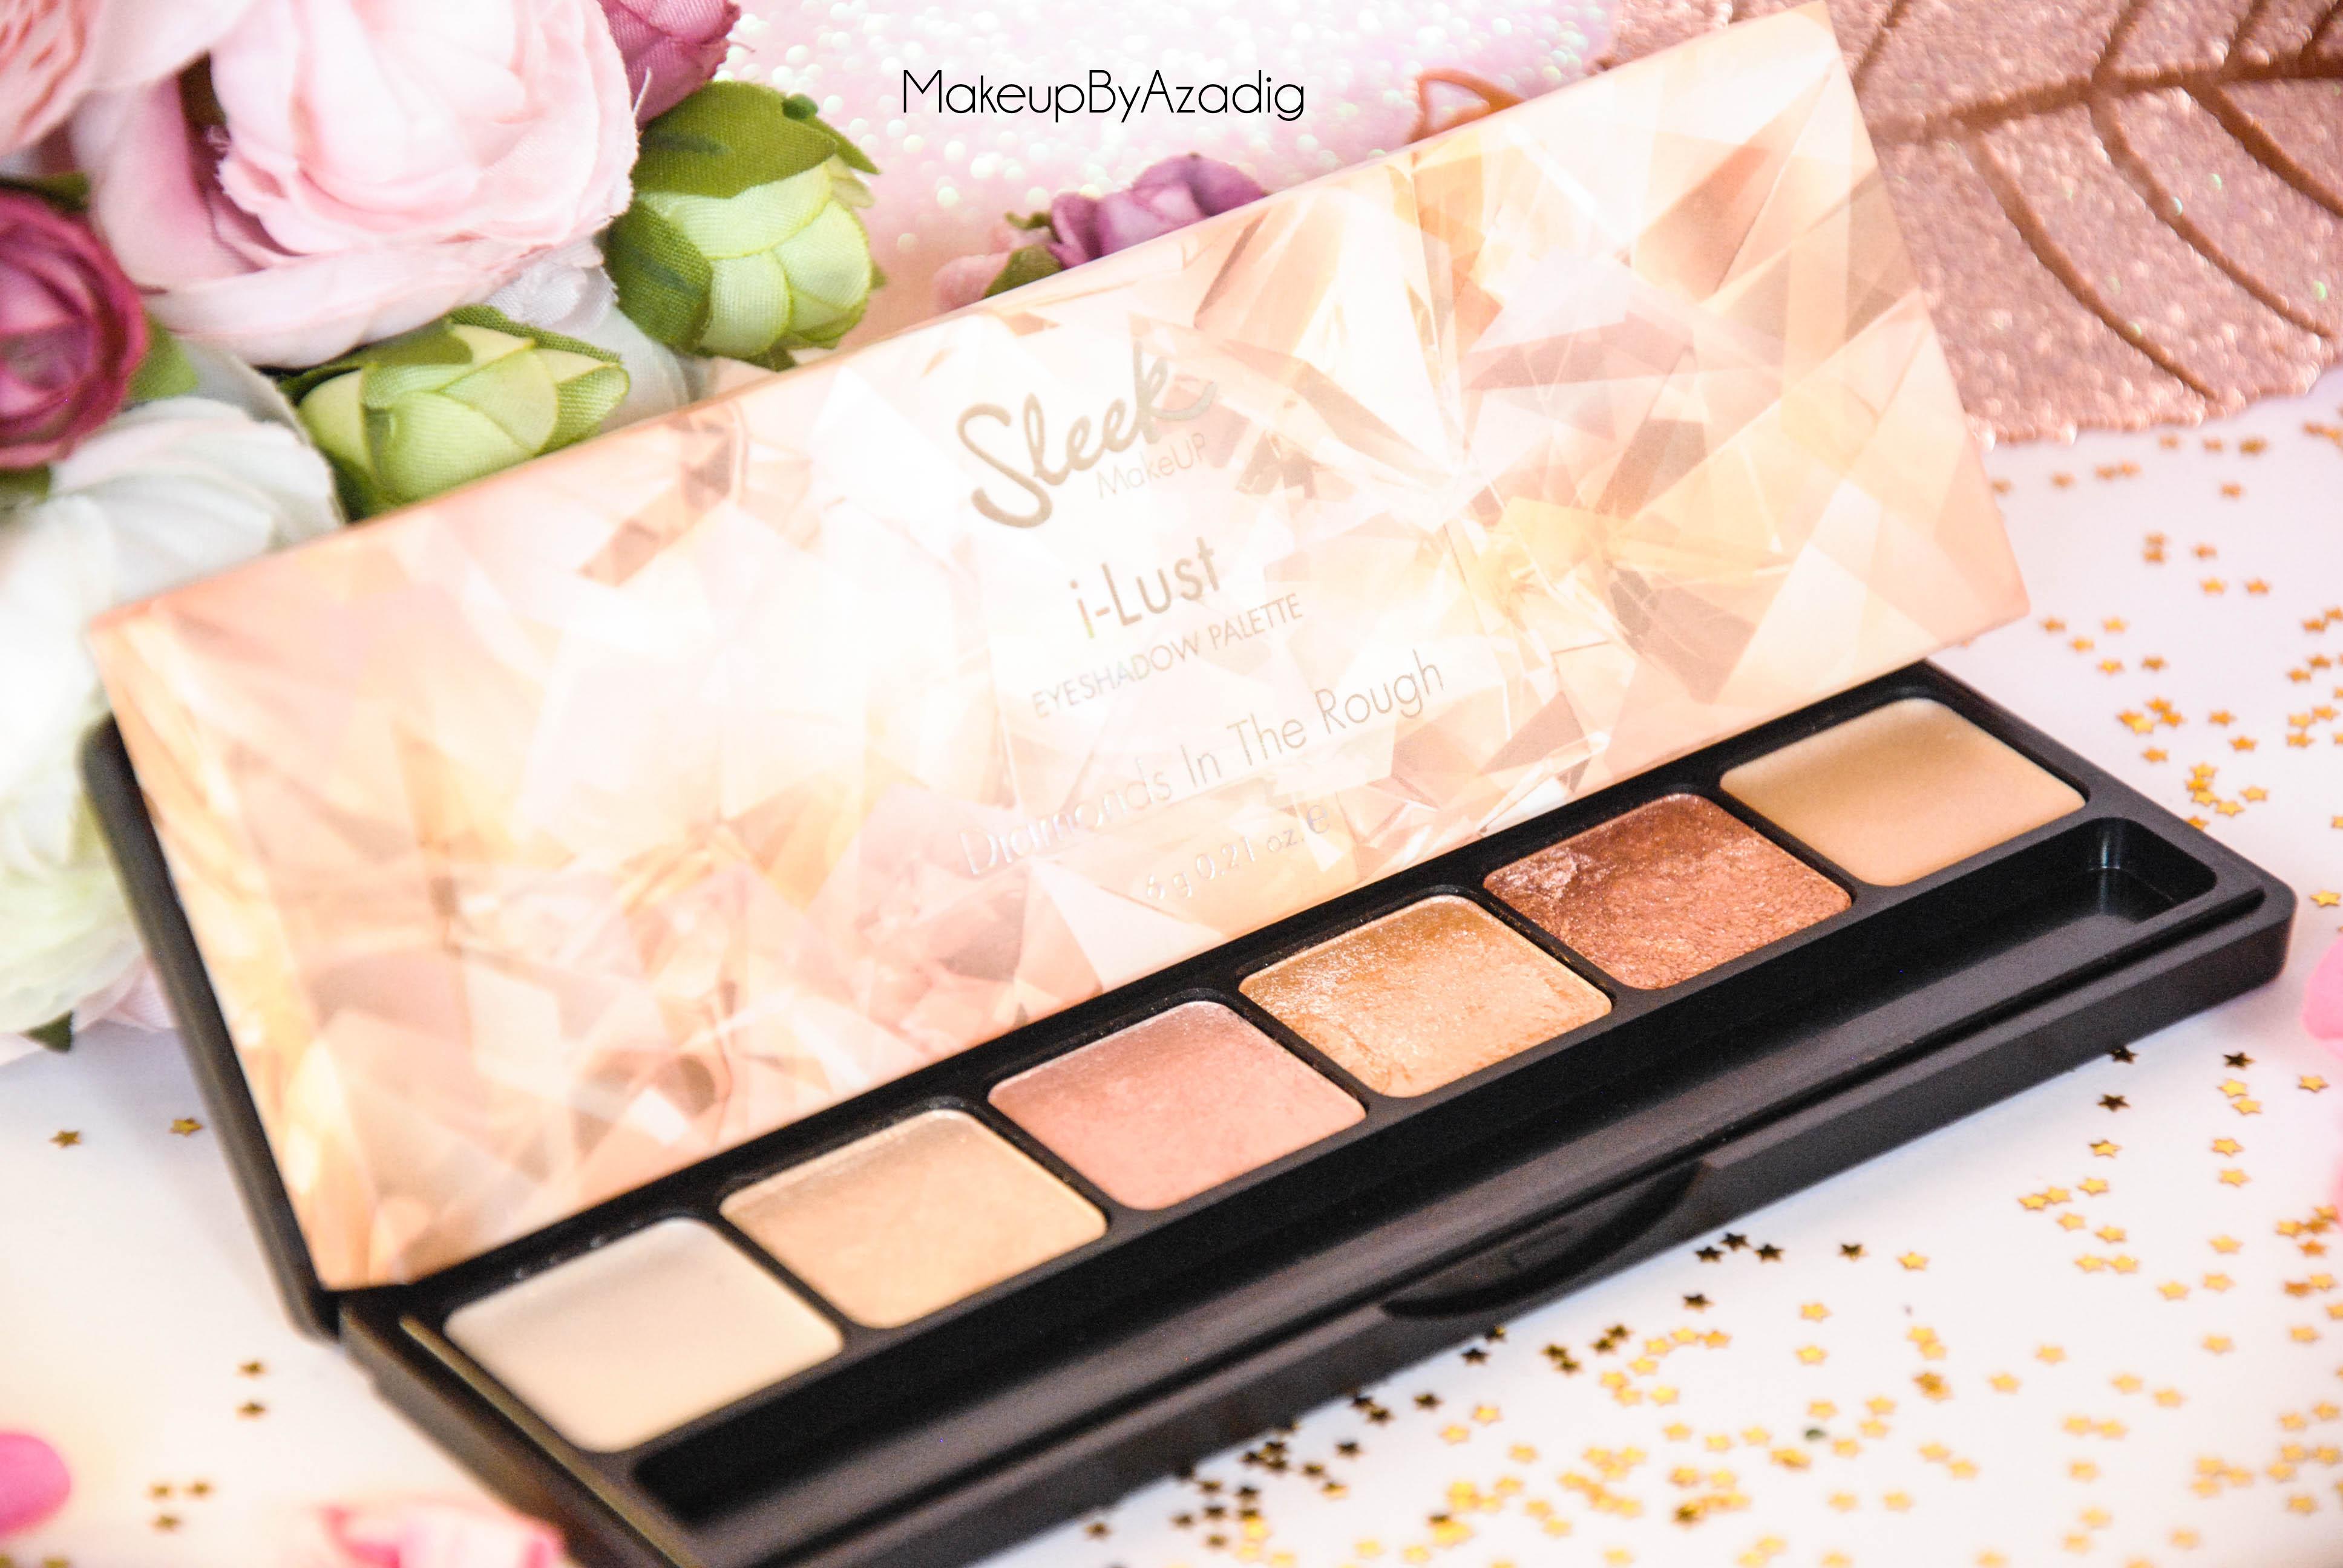 palette-eyeshadow-sleek-makeup-diamonds-in-the-rough-ilust-sephora-paris-makeupbyazadig-noel-code-promo-avis-prix-miniature